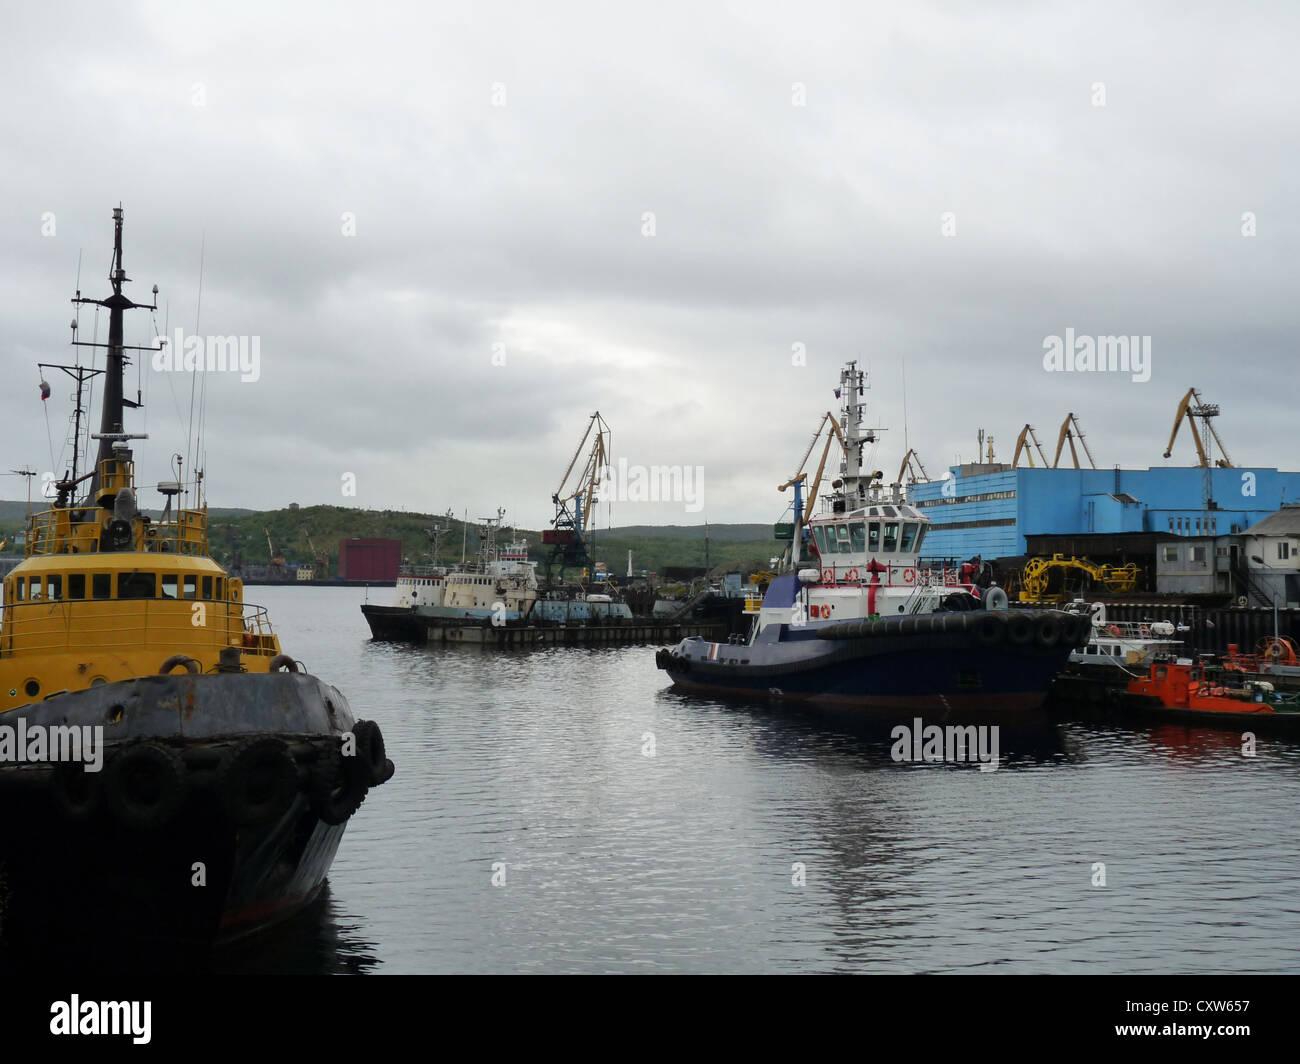 ship, ships, marine station Murmansk, Murmansk, Russia, north, polar circle, port, cargo port - Stock Image